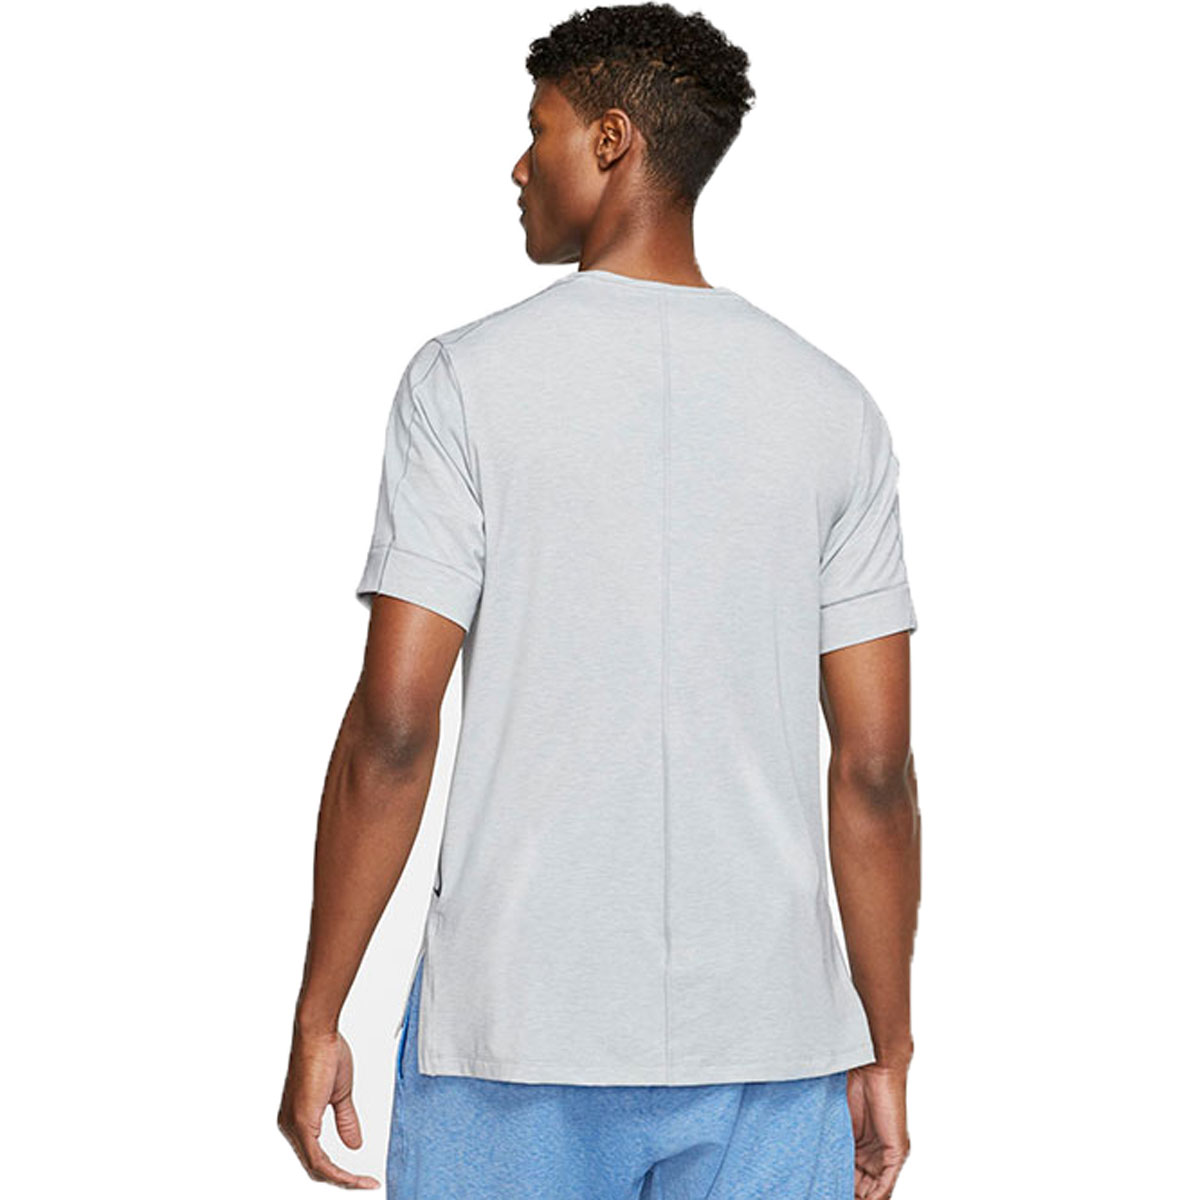 Men's Nike Dri-FIT Yoga Short Sleeve Top, , large, image 2